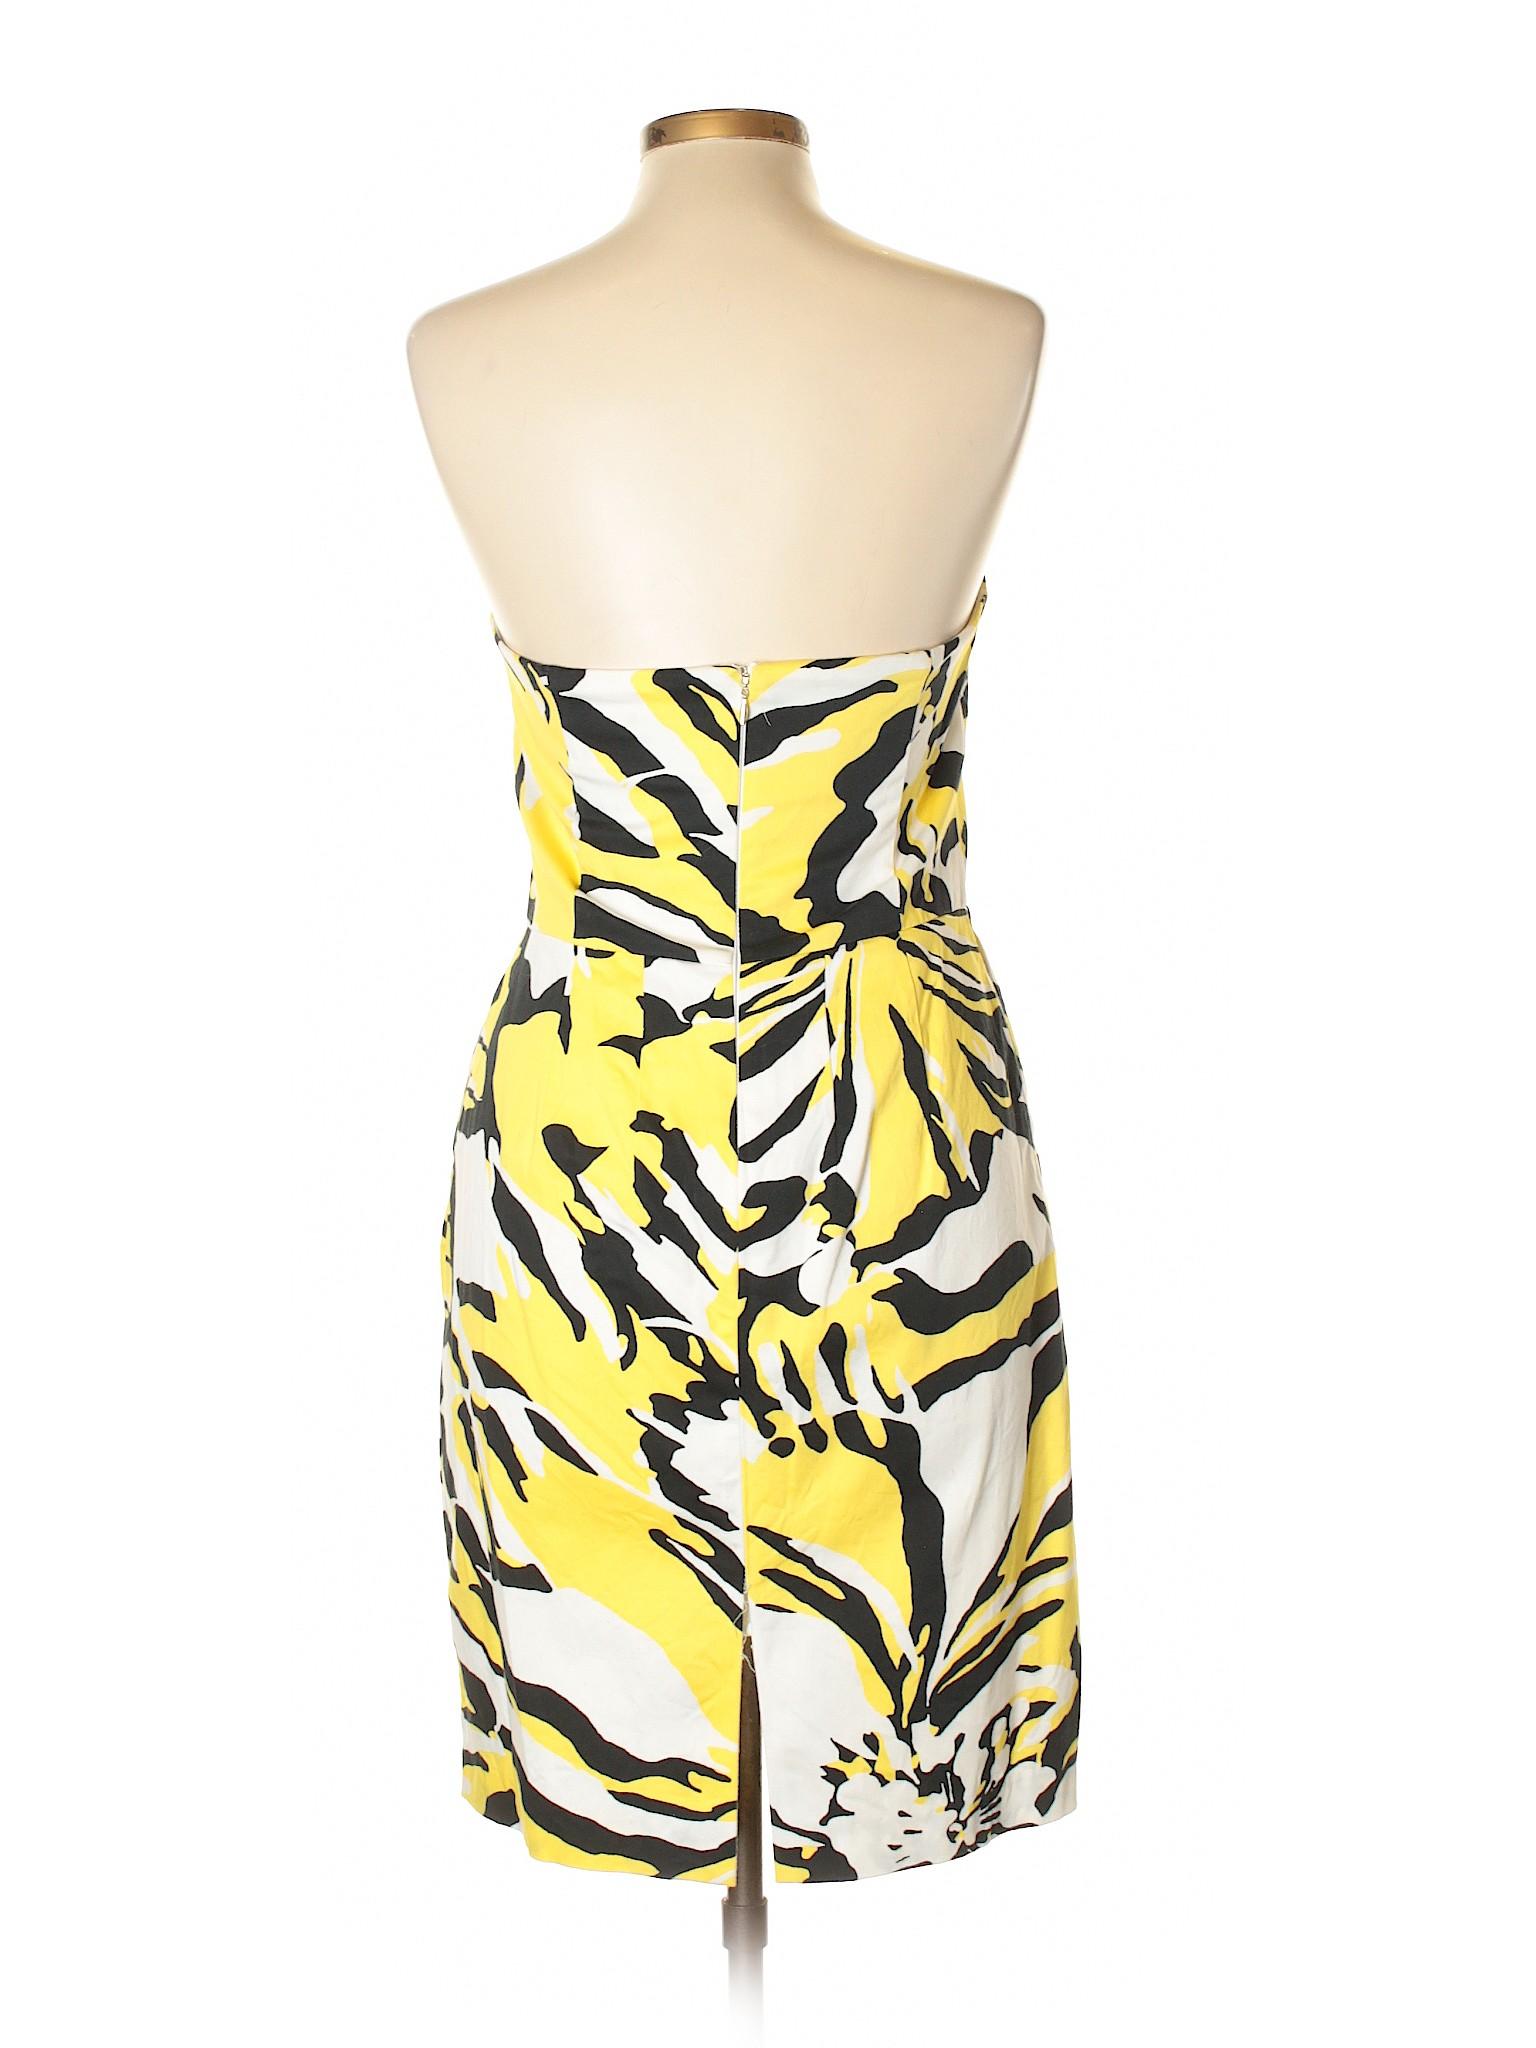 Dress Selling Casual Design Studio Express qgIRB4